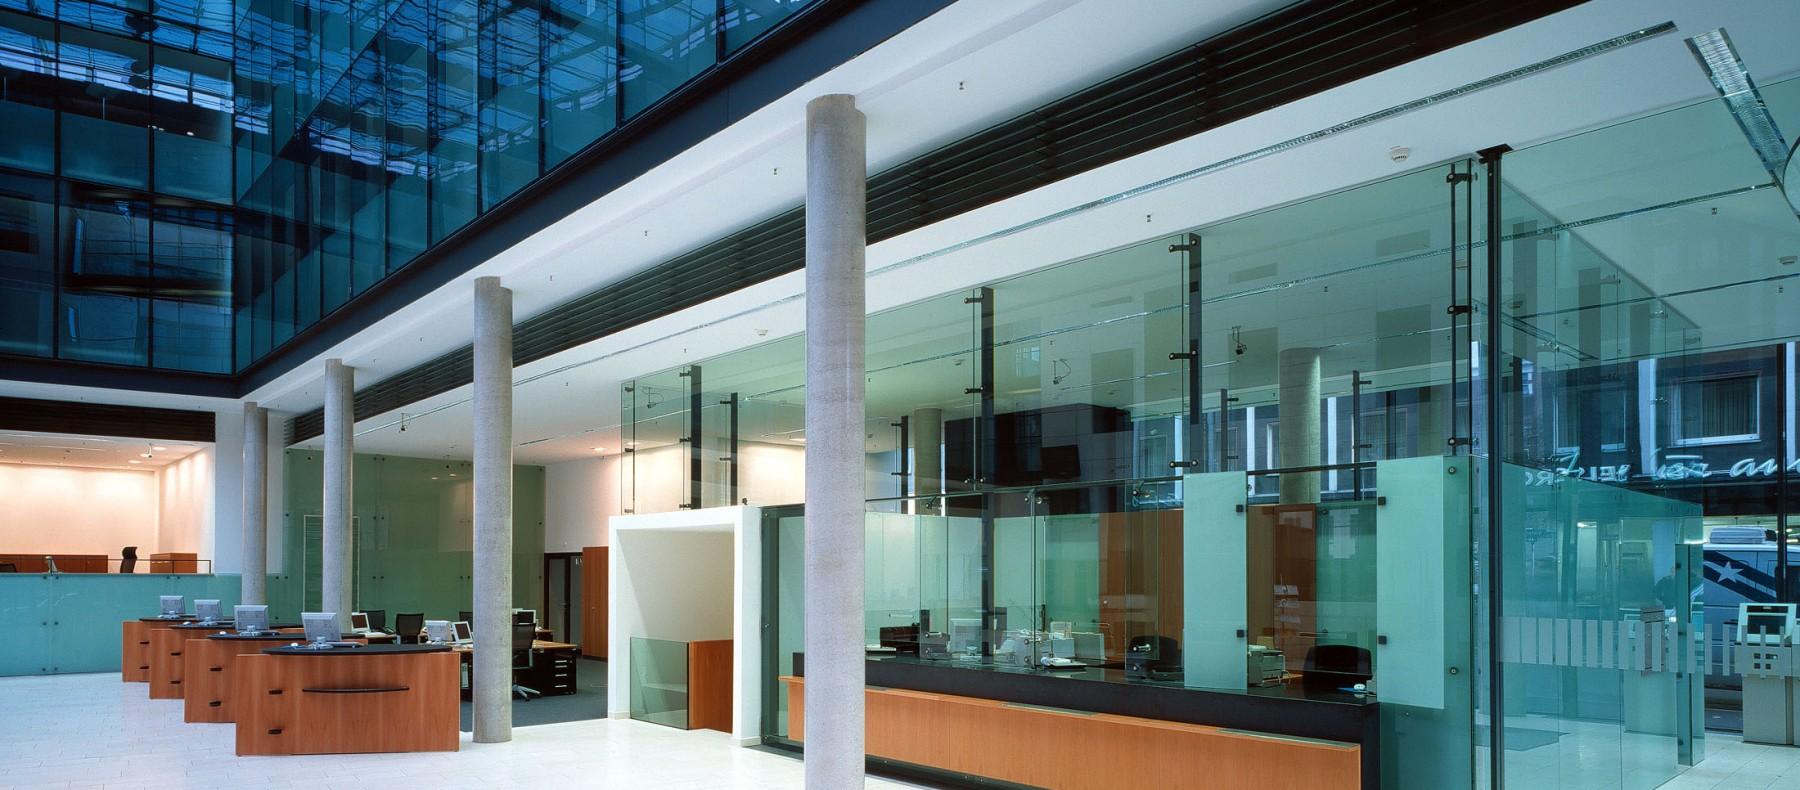 Volksbank Dortmund Kirchhörde